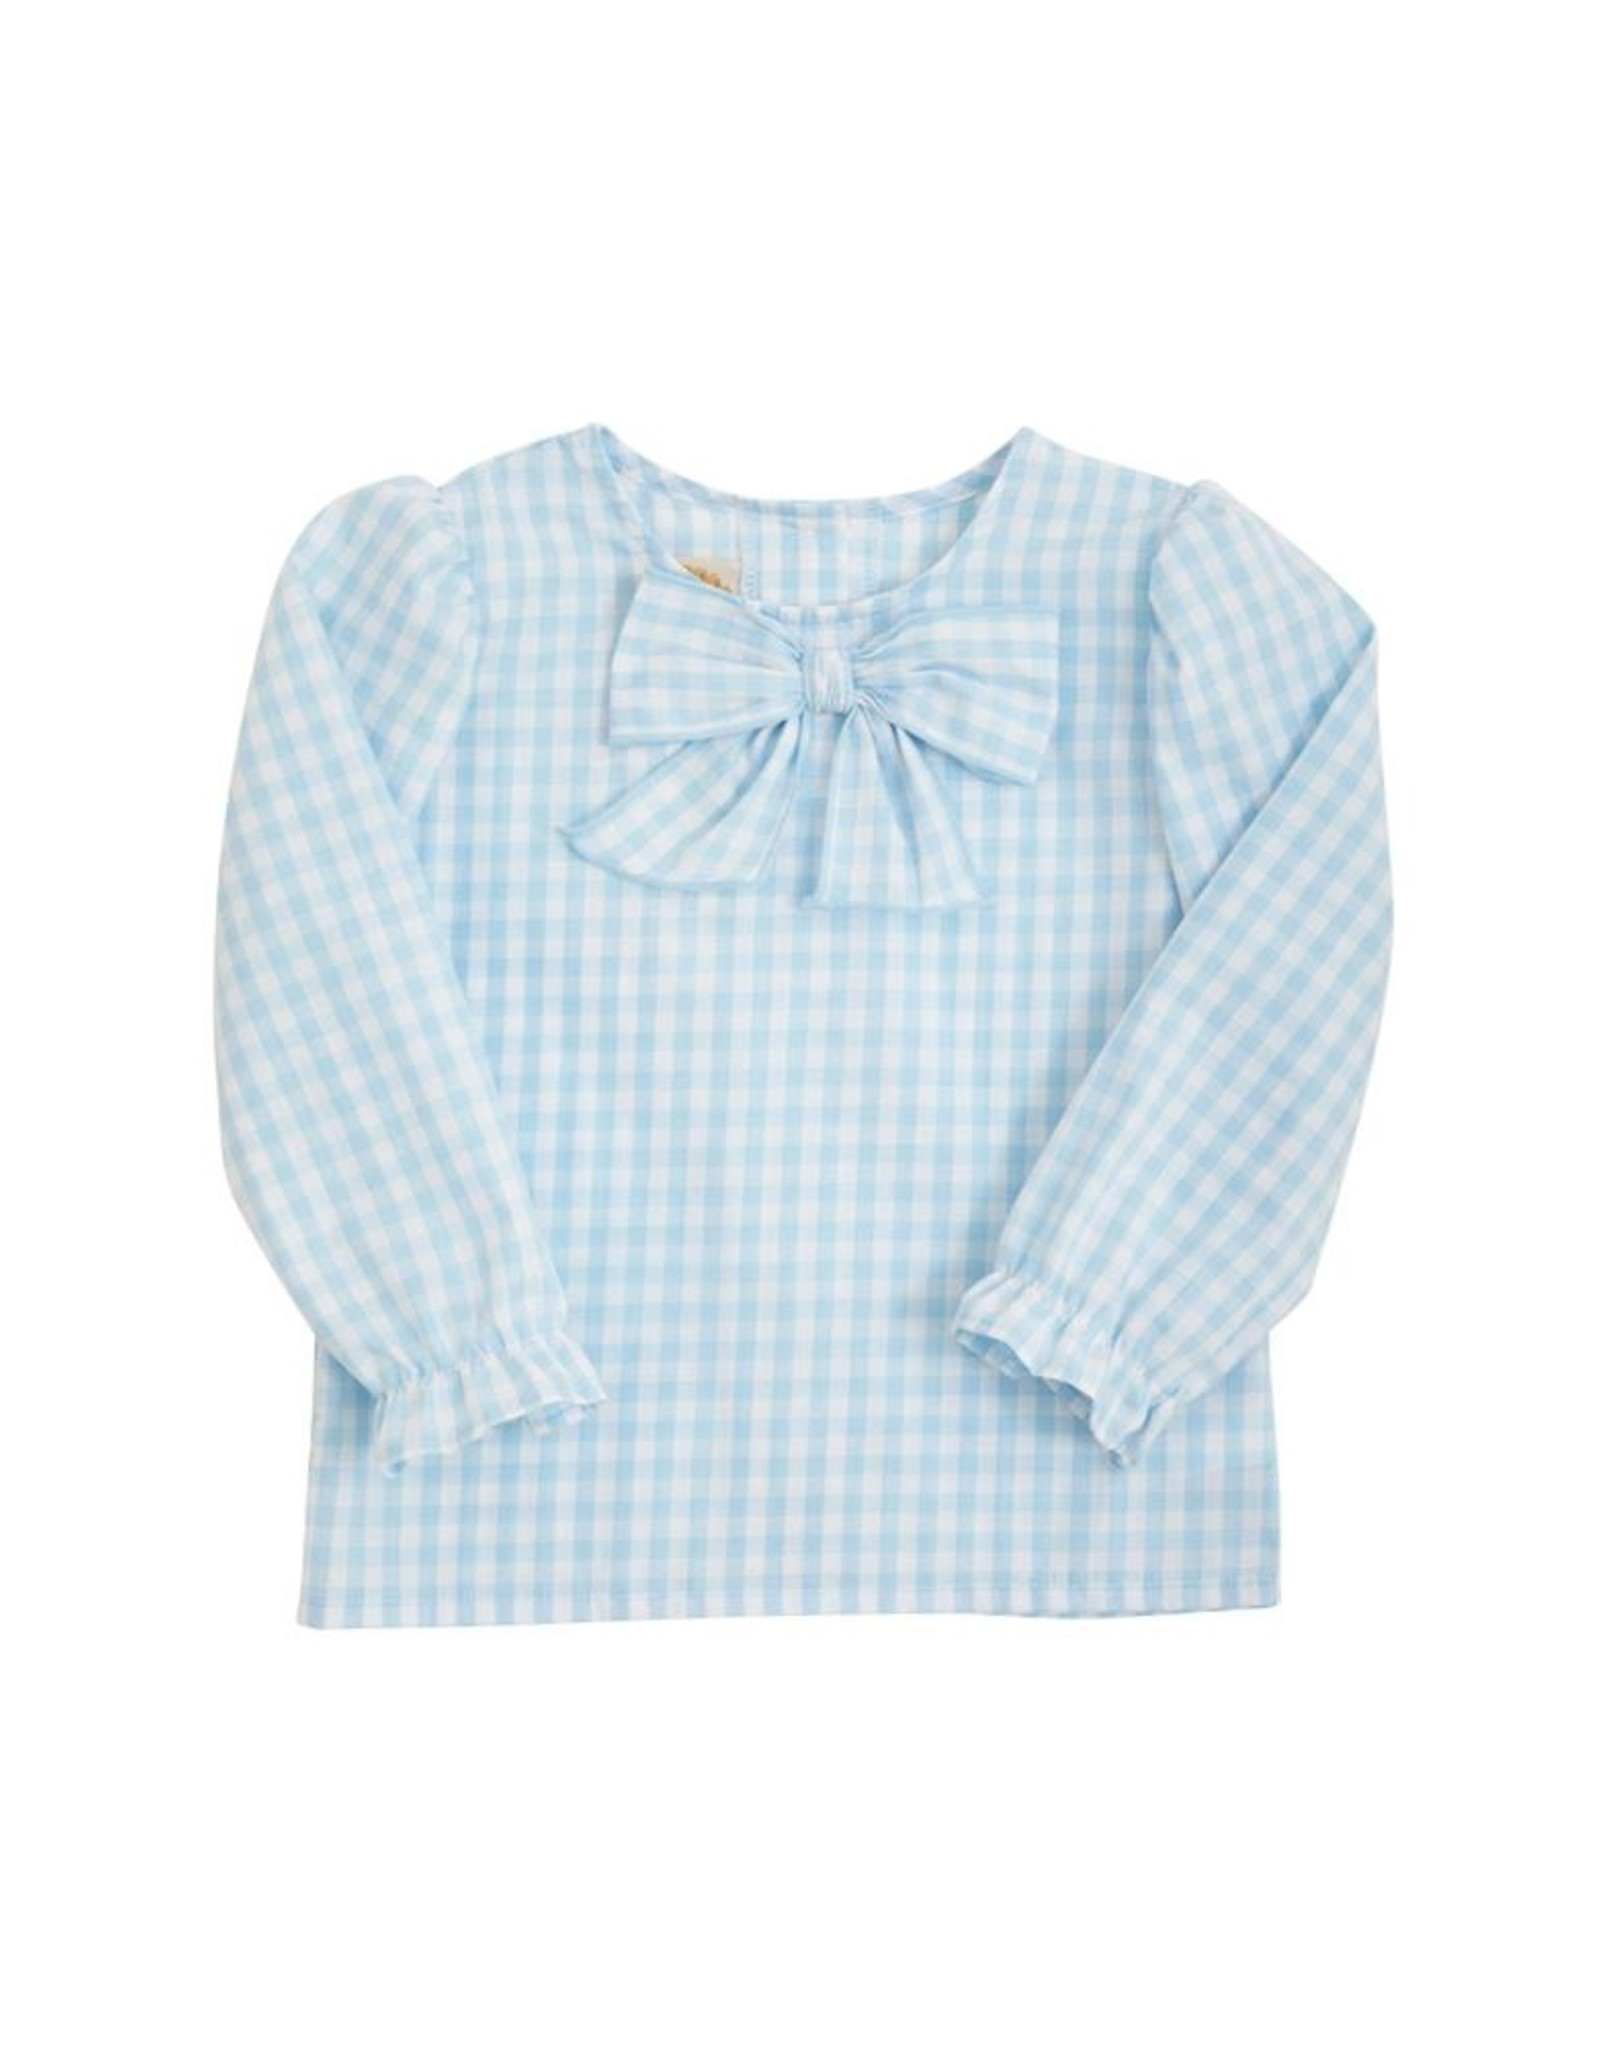 The Beaufort Bonnet Company Beatrice Bow Blouse Buckhead Blue Gingham